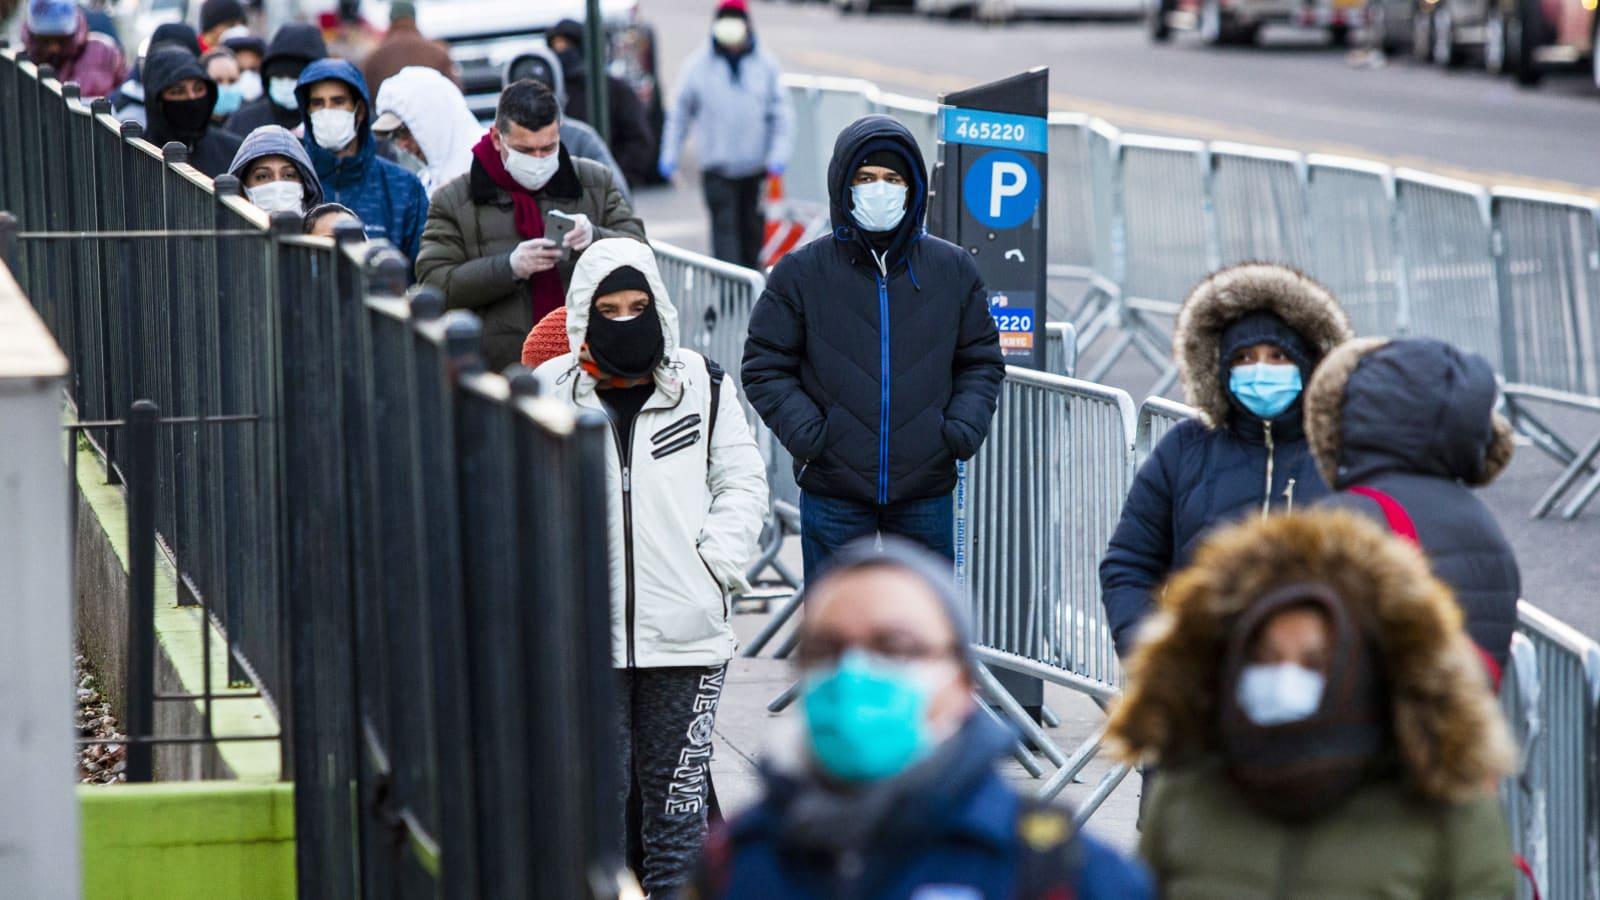 Hundreds flood NYC hospital ICU and ERs as global coronavirus cases top  466,000